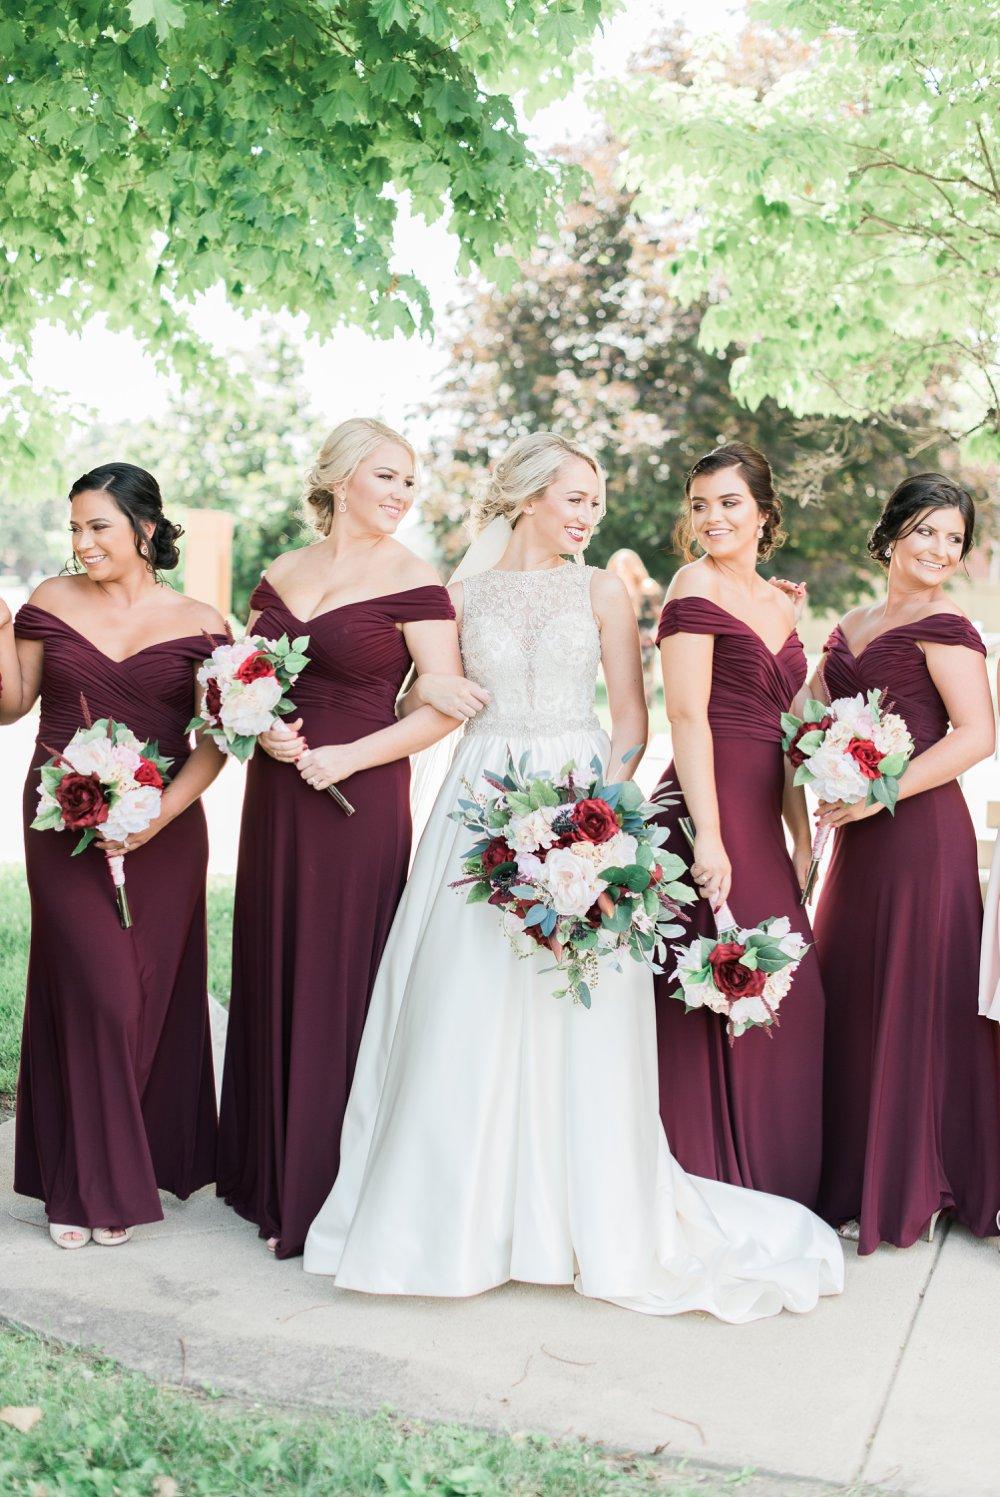 shawnee-lodge-state-park-wedding-portsmouth-ohio_0024.jpg